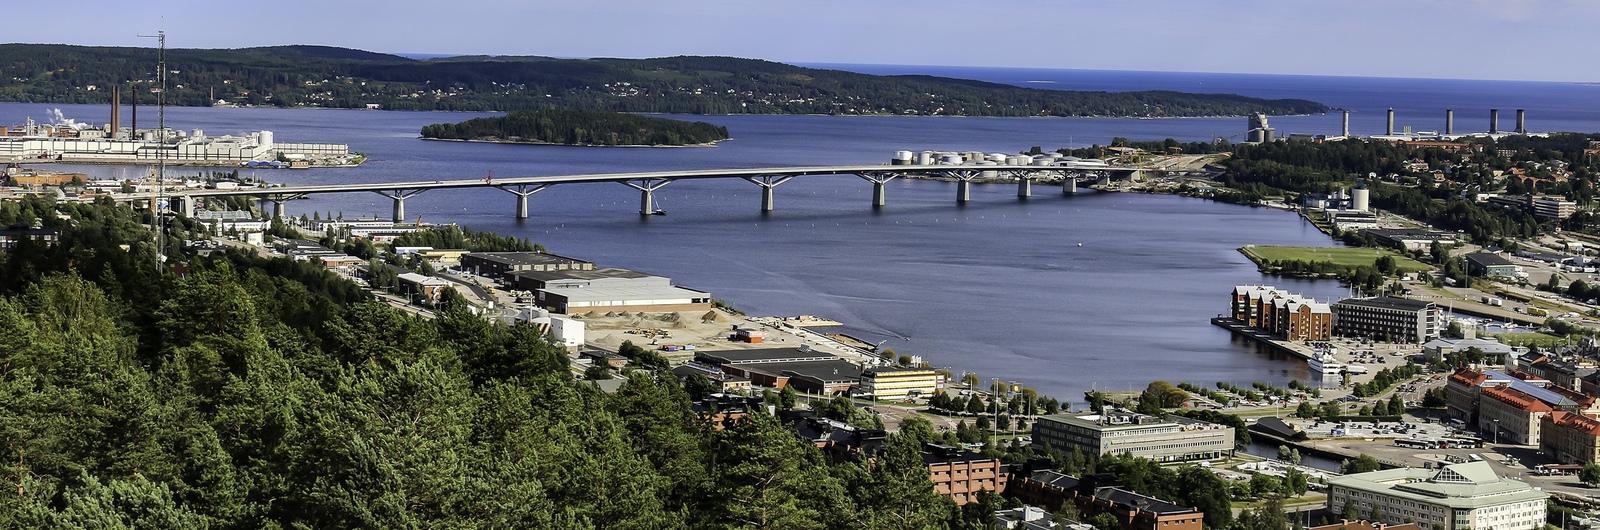 sundsvall city header